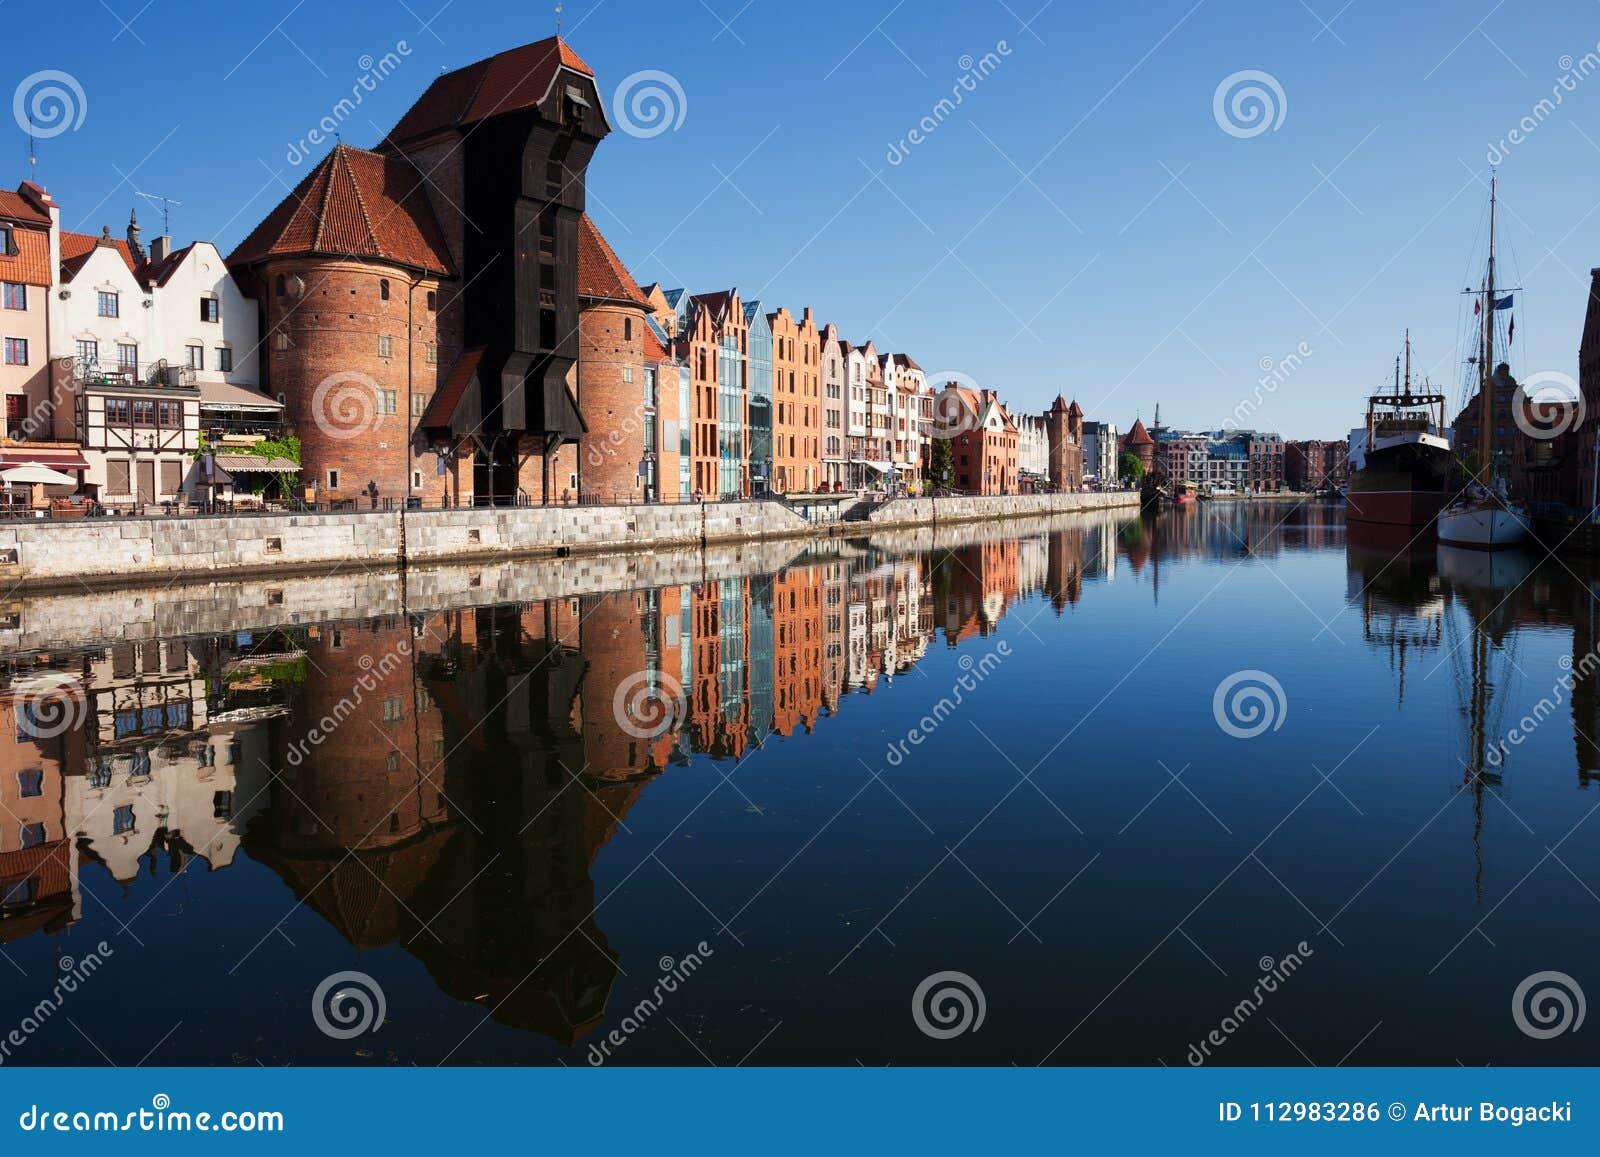 City Skyline Of Gdansk River View